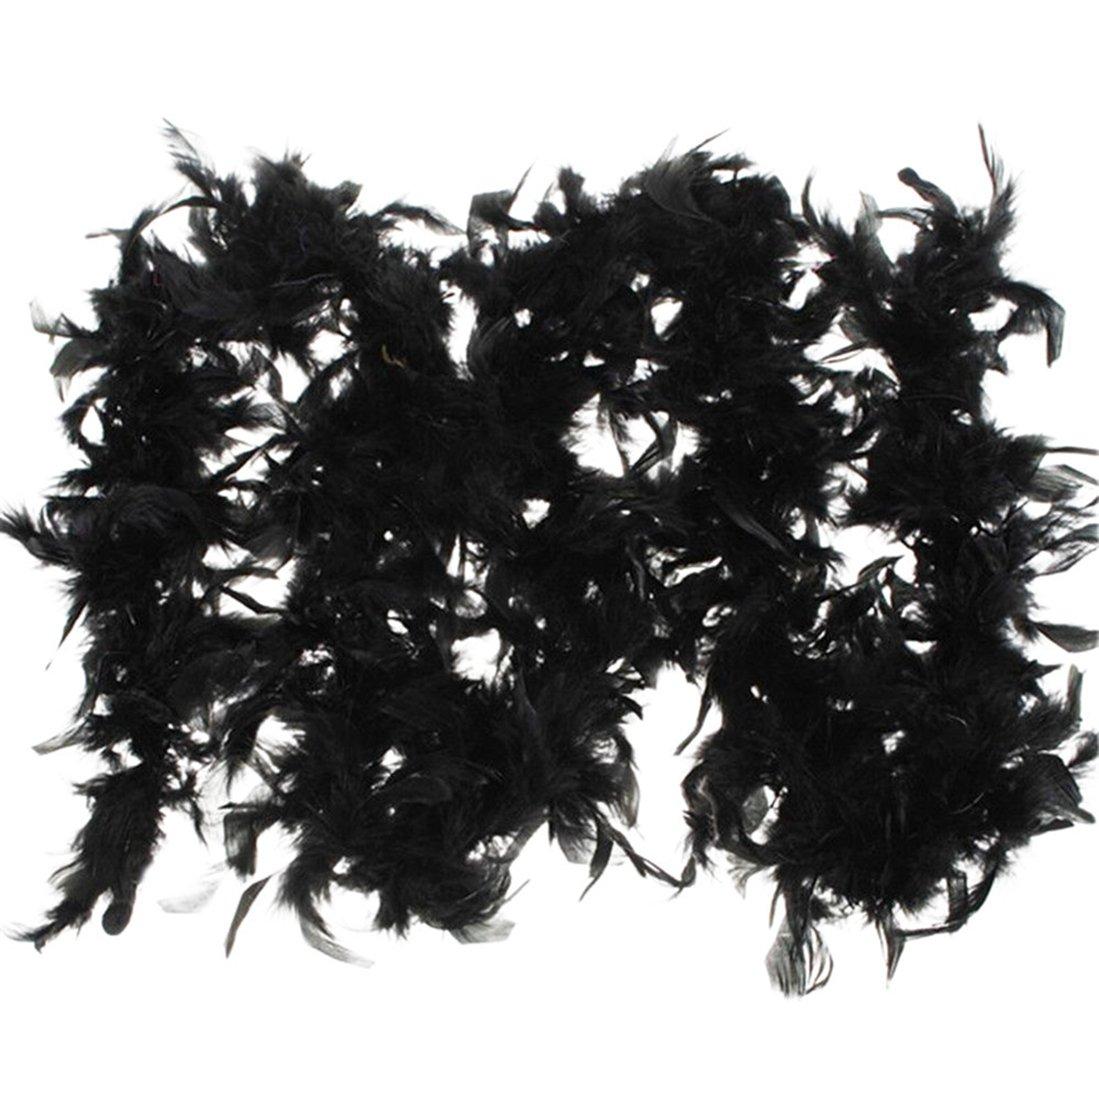 Saihui Fancy Dress Feather Boa Burlesque Showgirl Hen Night Accessory Festival Ornamental Scarf-Available in 7 colors Black